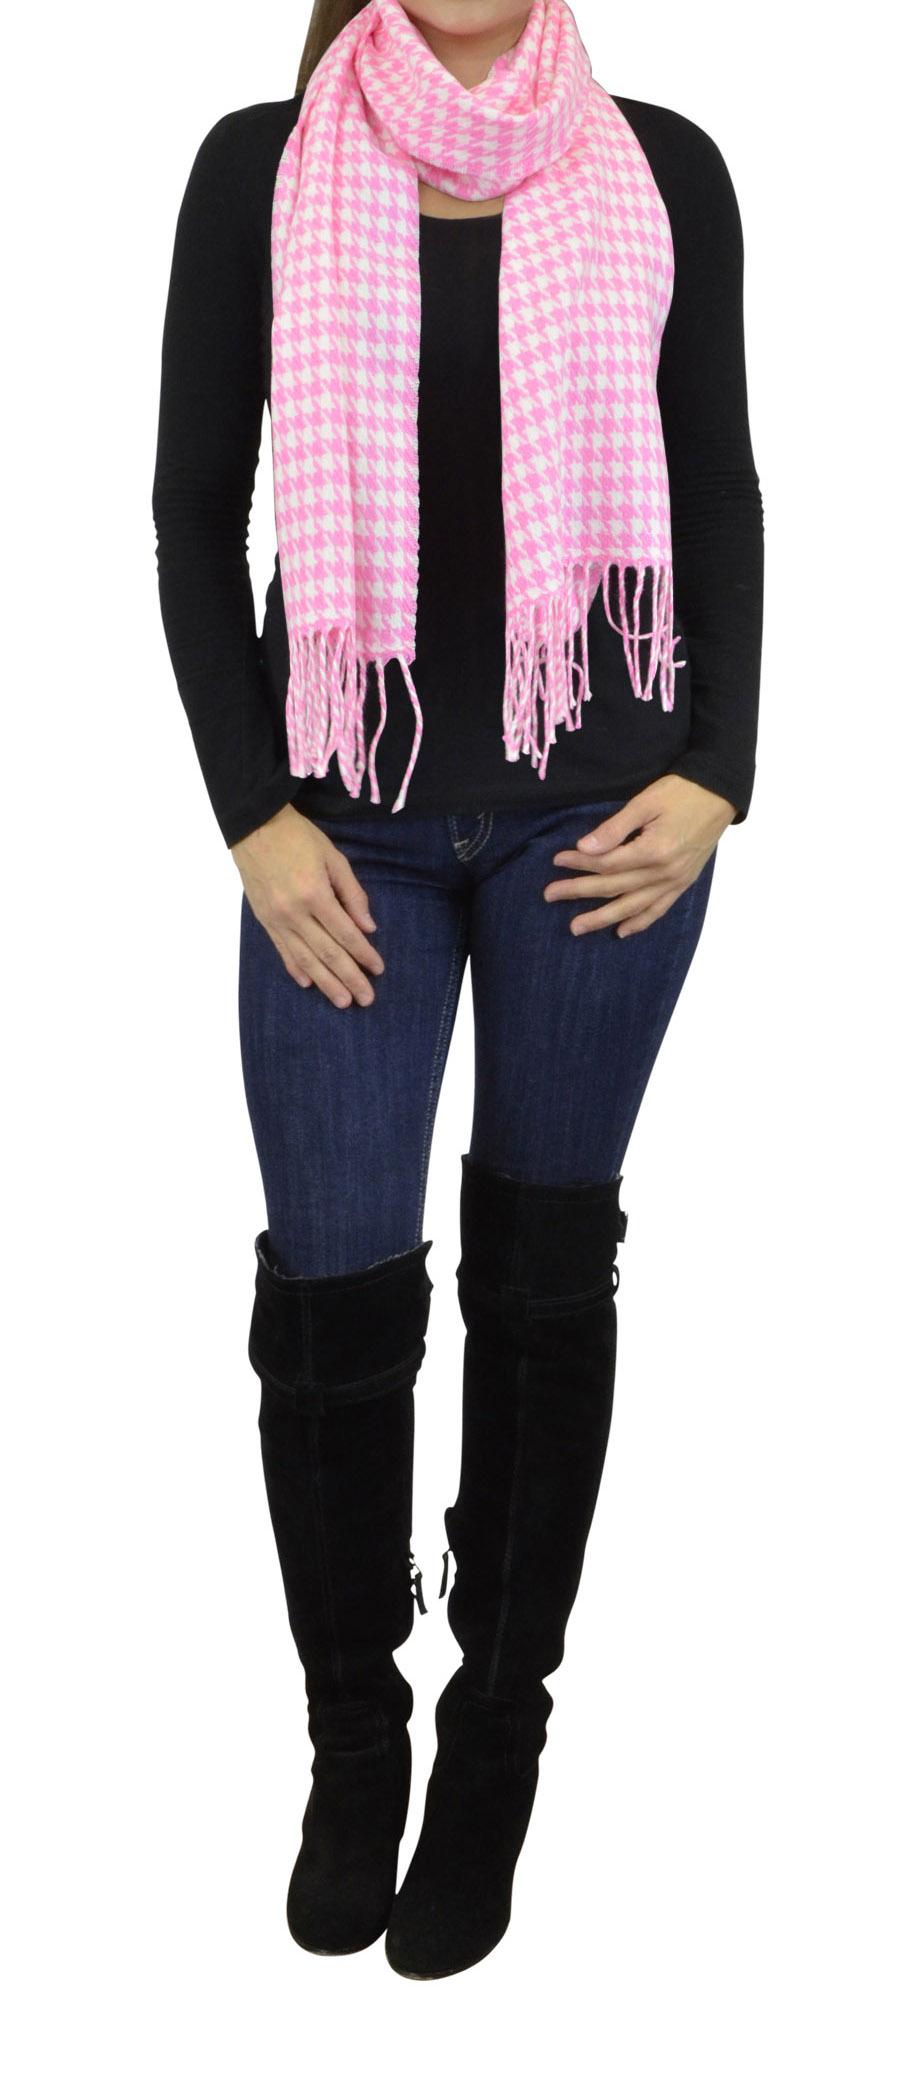 Belle Donne - Women Cashmere Feel Scarf Houndstooth Scarf Shawl Wrap 72x12 - Fuchsia